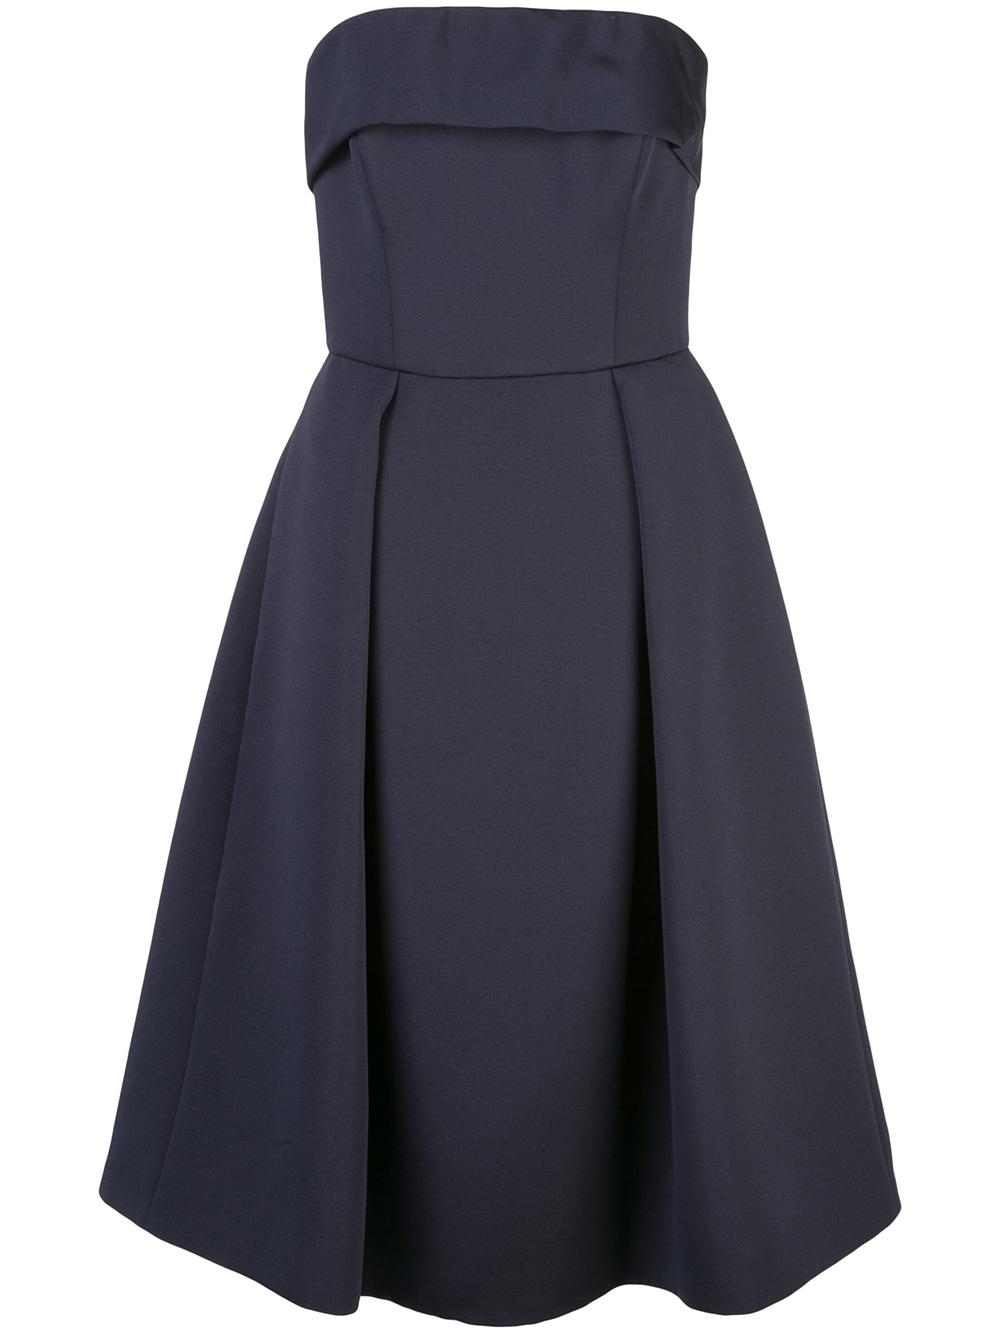 Soft Faille Strapless Tea Length Dress Item # LW140